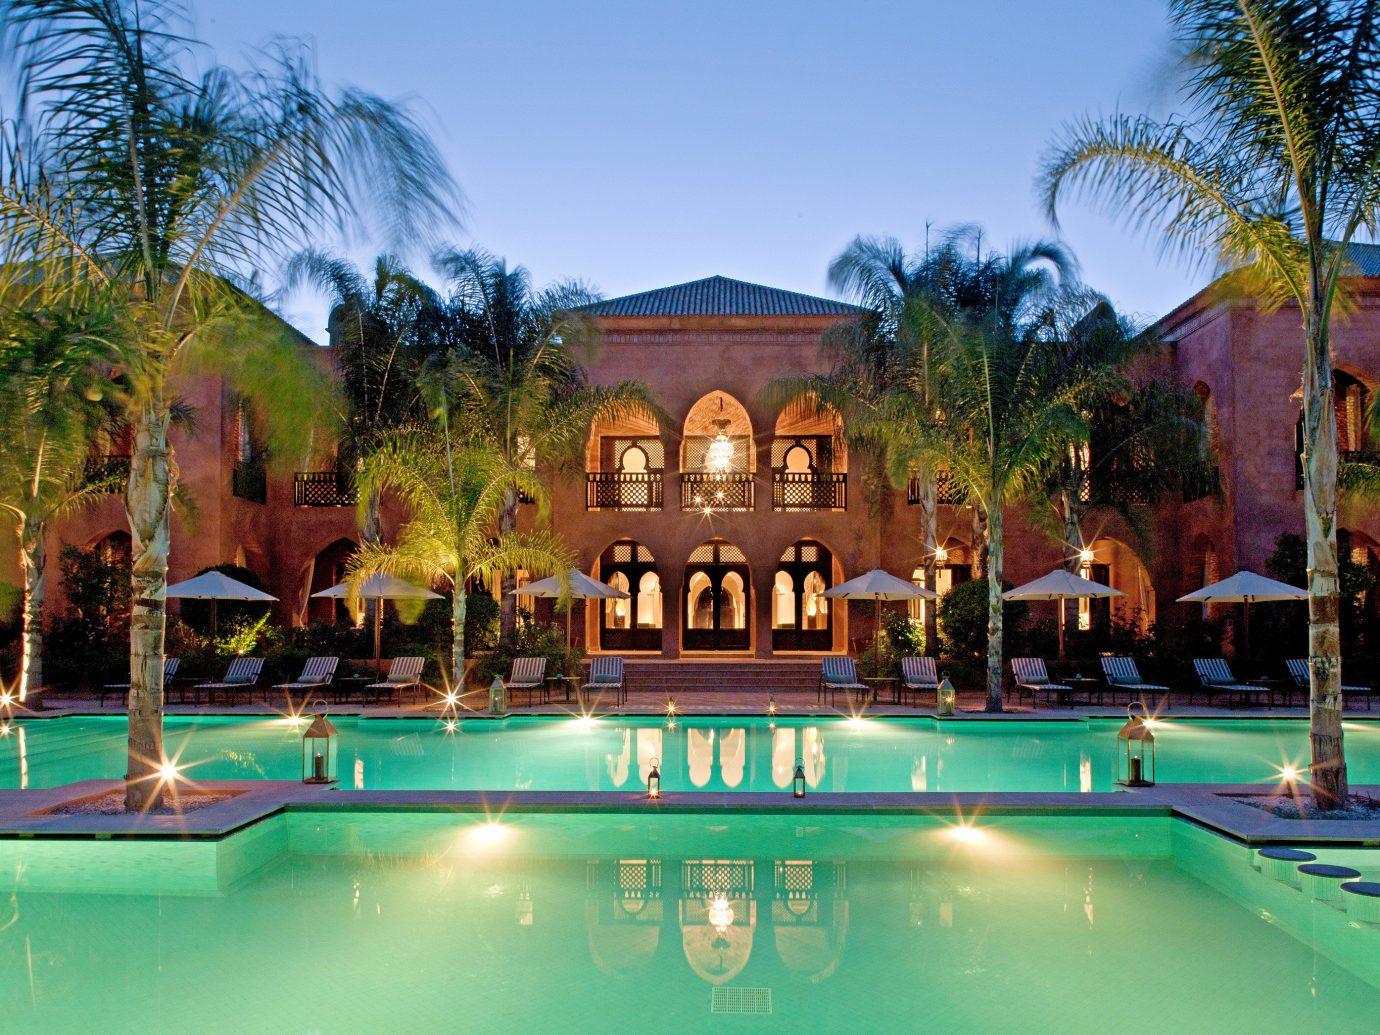 Trip Ideas tree sky outdoor leisure swimming pool Resort estate property building vacation home Villa mansion palace hacienda